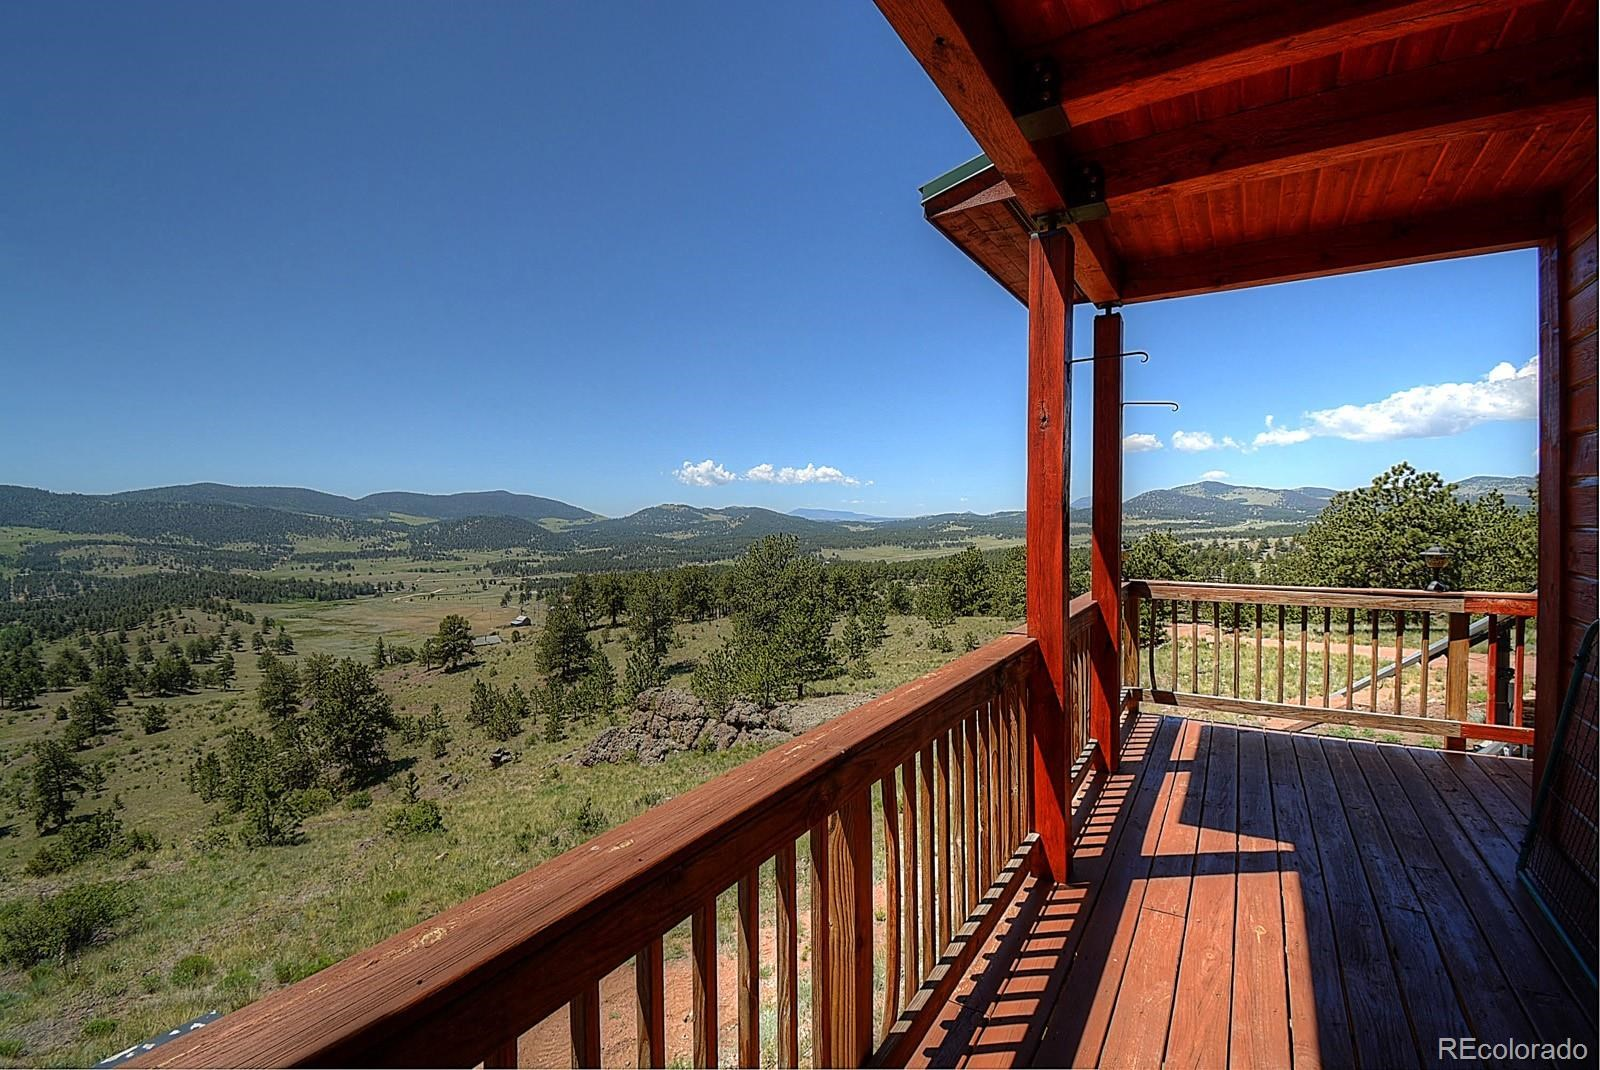 MLS# 8182693 - 29 - 396 Eagle Nest Trail, Guffey, CO 80820